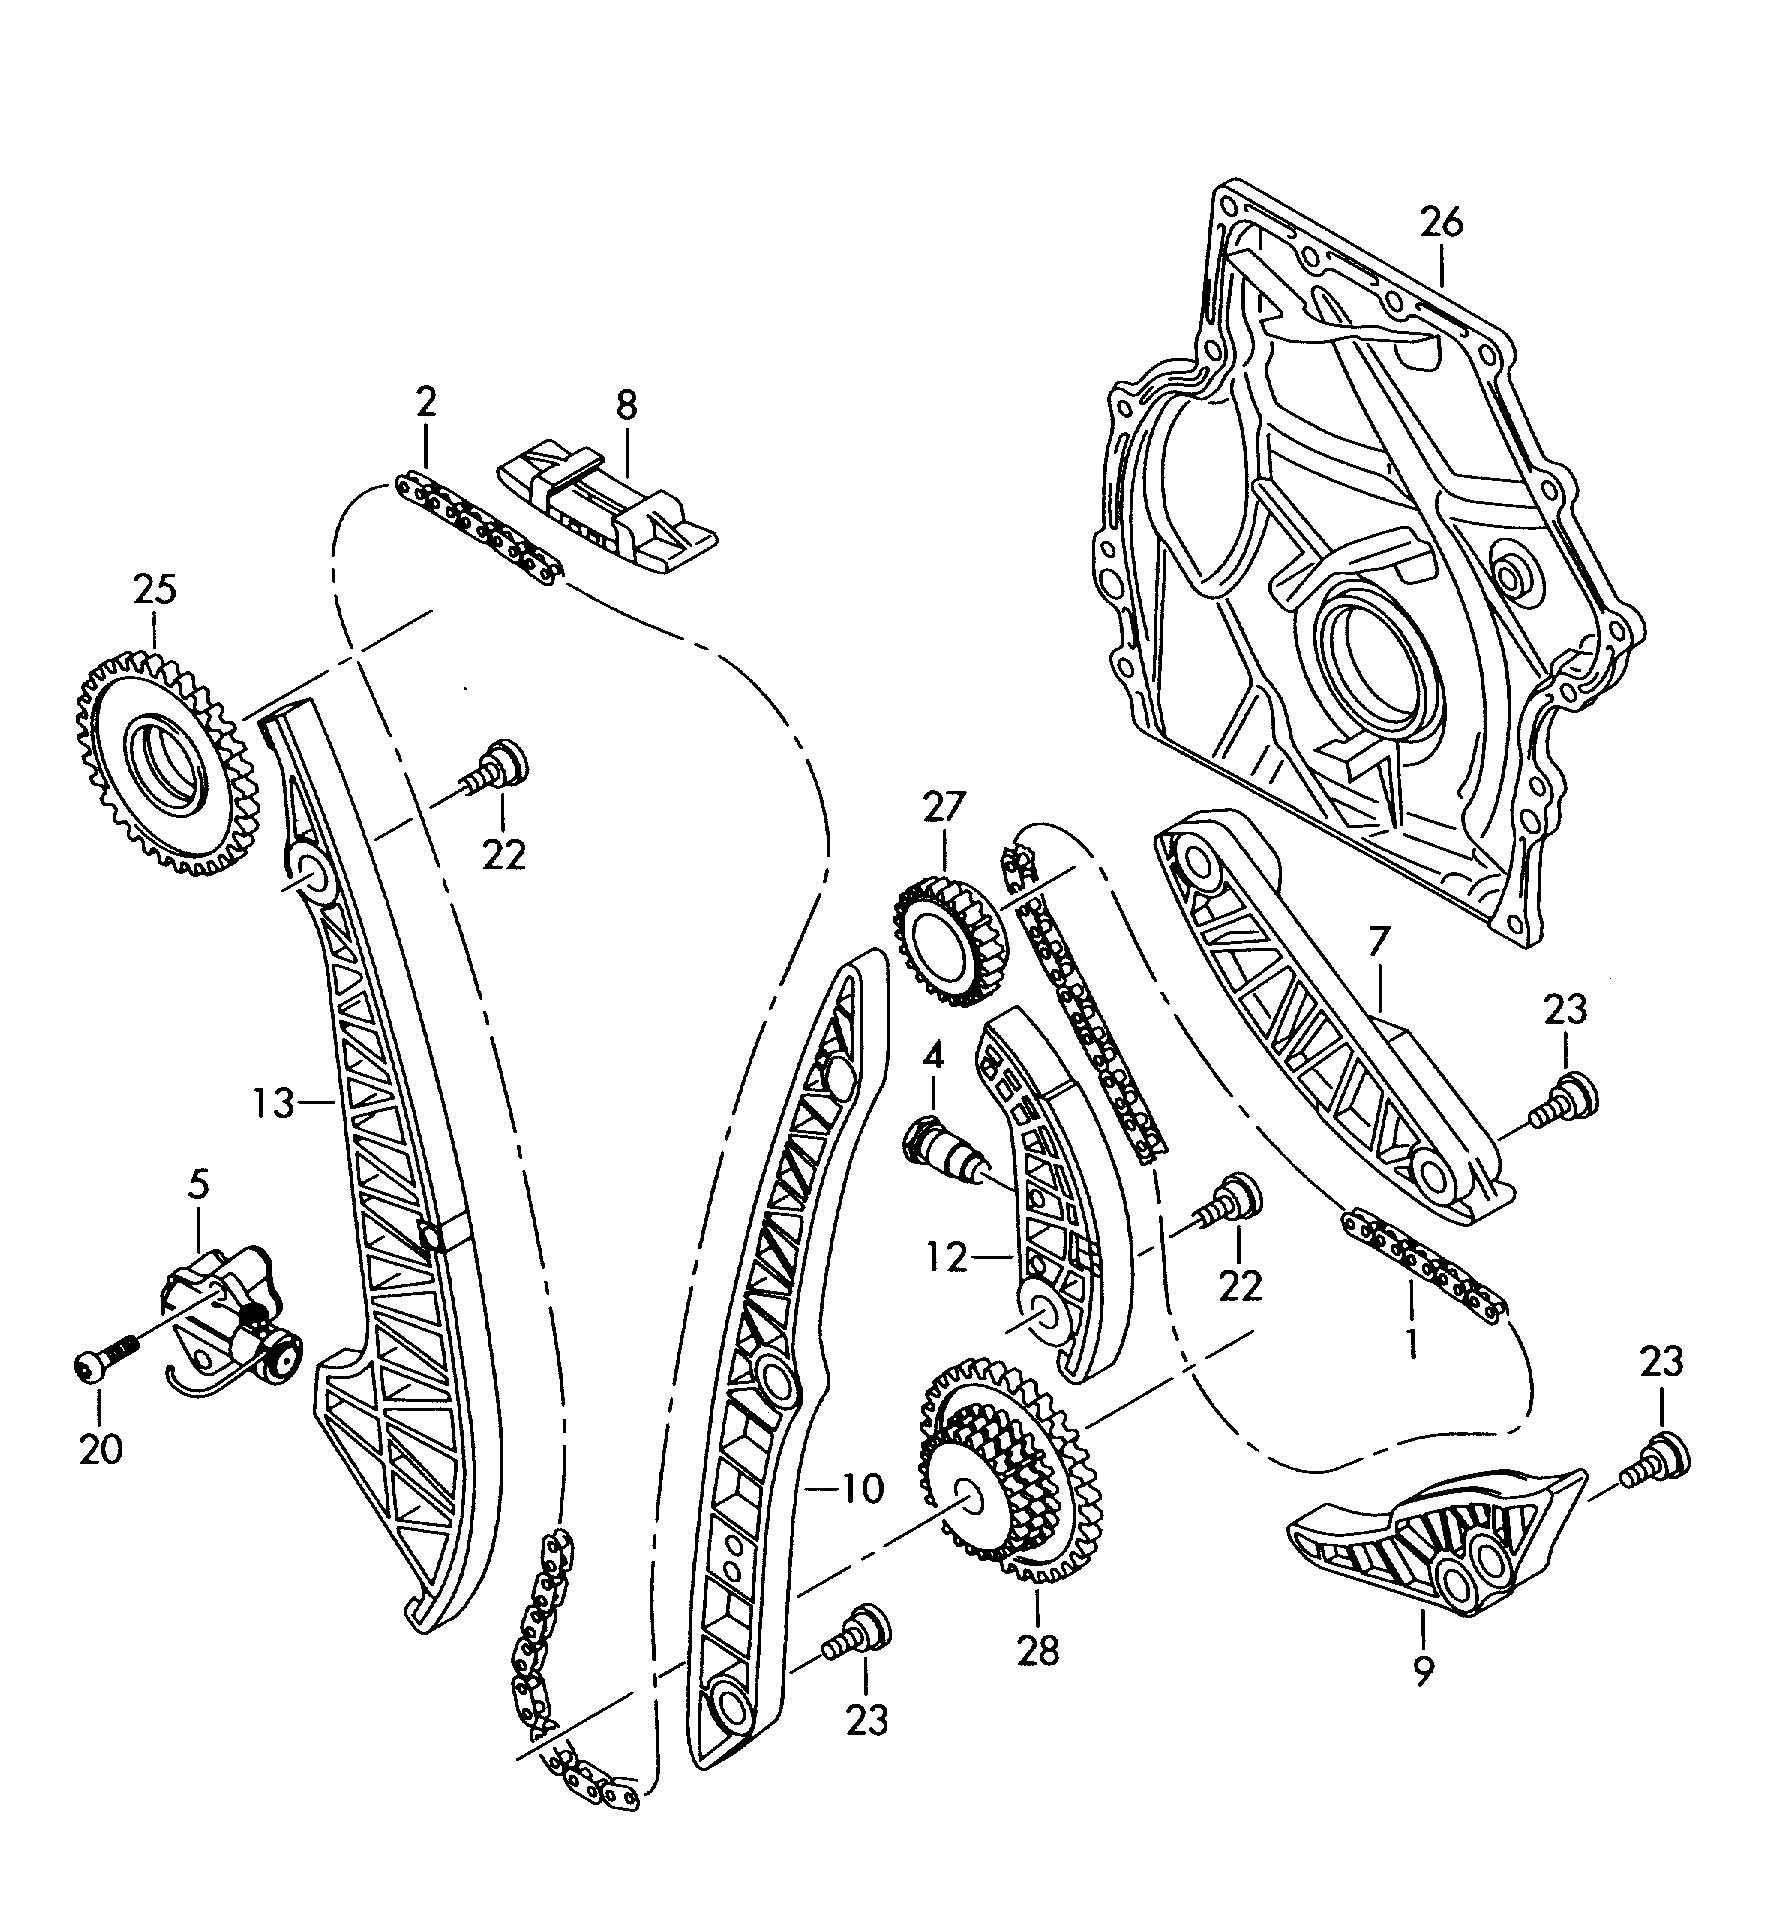 Volkswagen Passat Guide Rail Guide Piece Primary